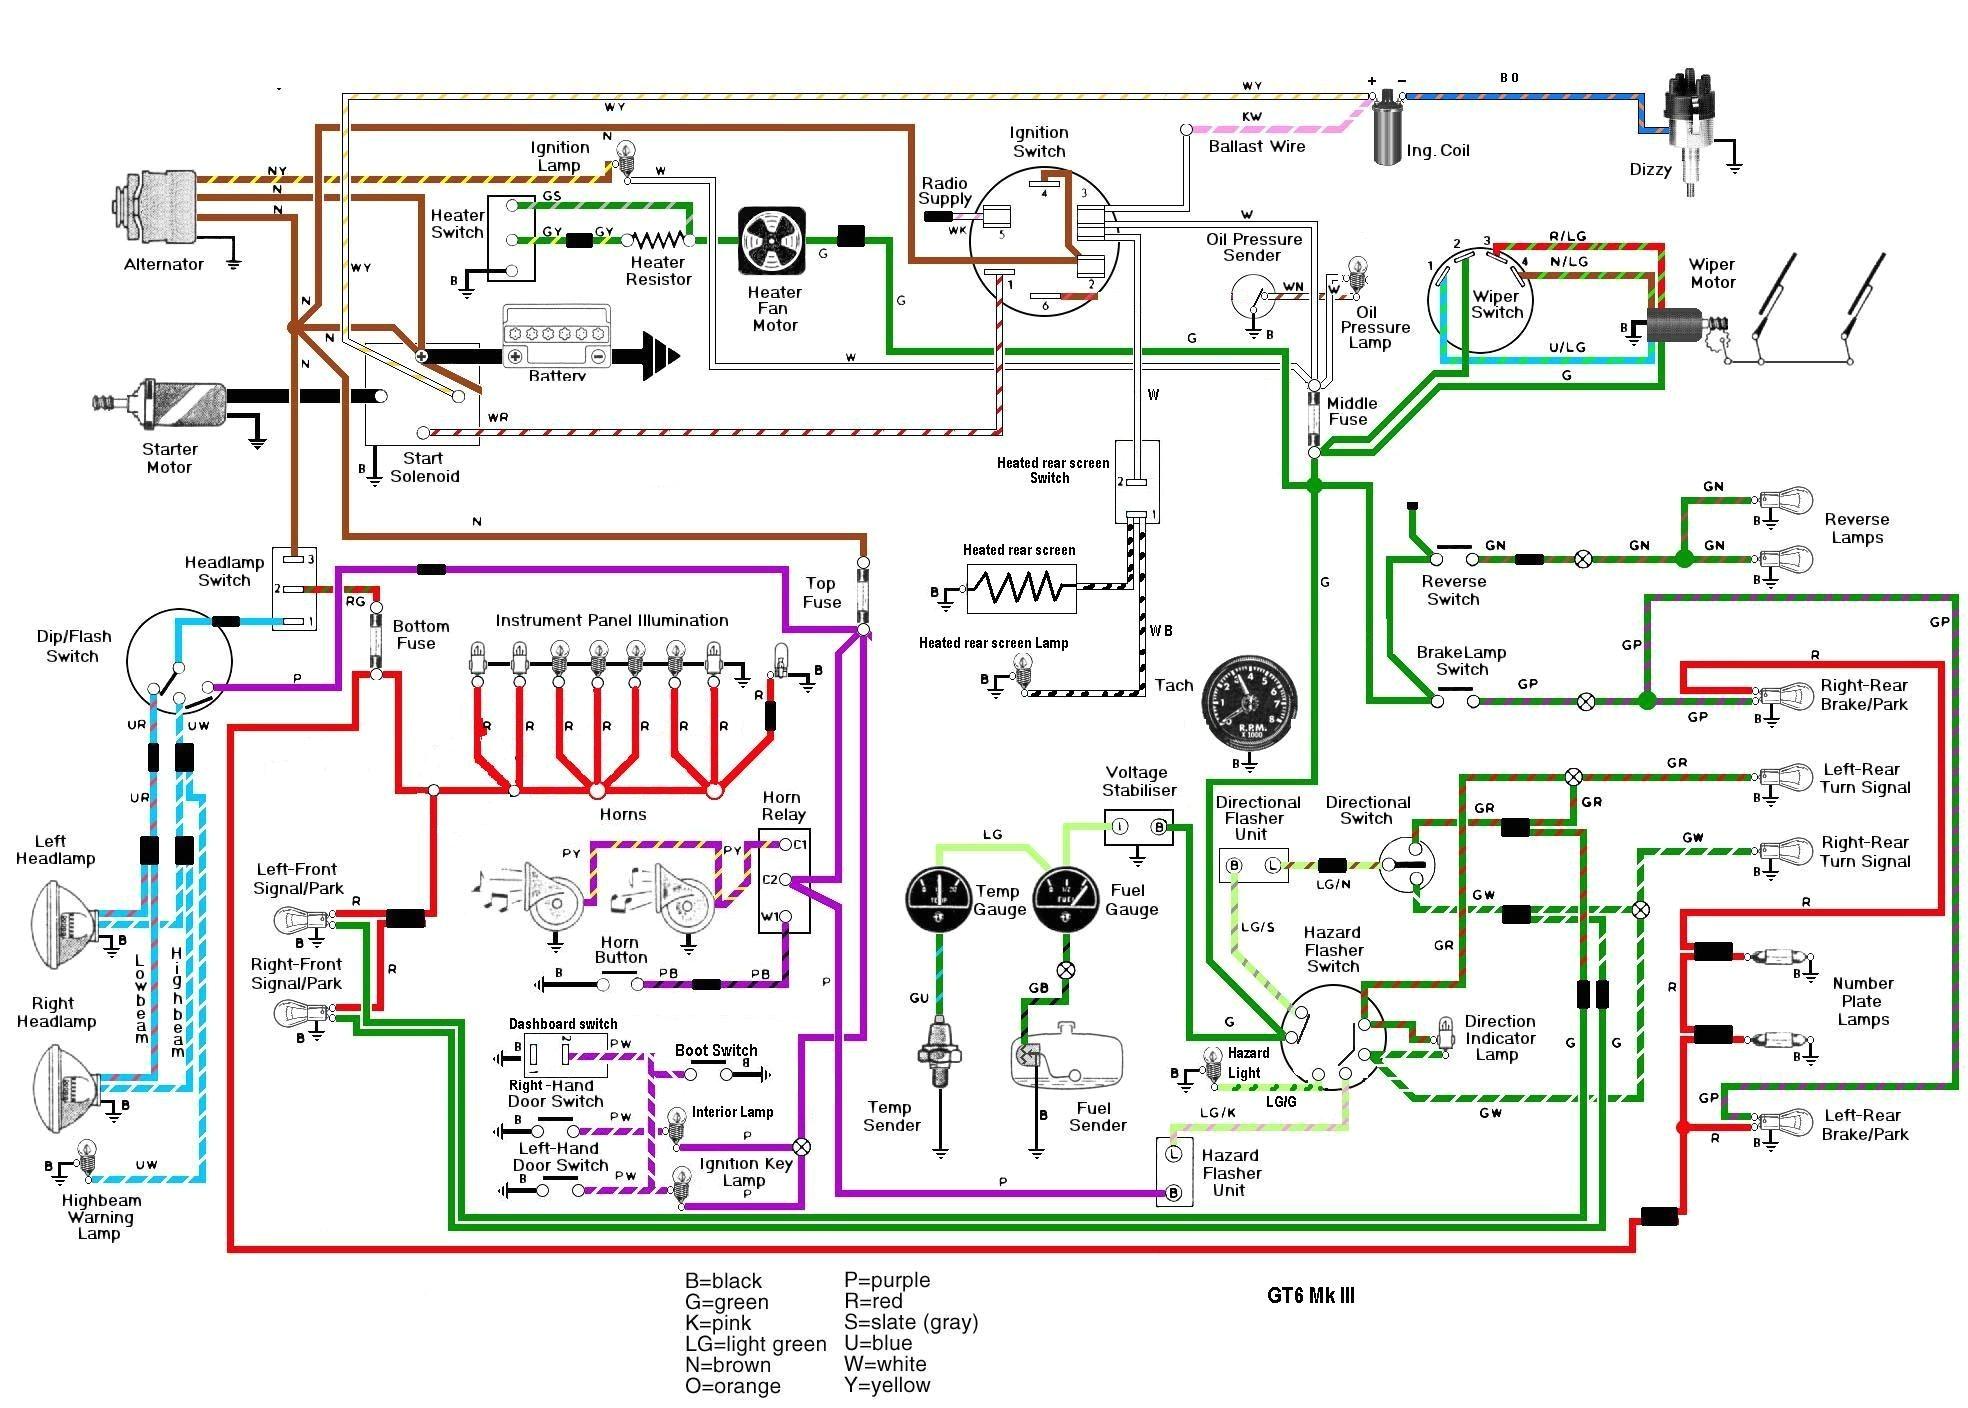 tr6 wiring diagram wiring diagram 76 triumph tr6 wiring diagram